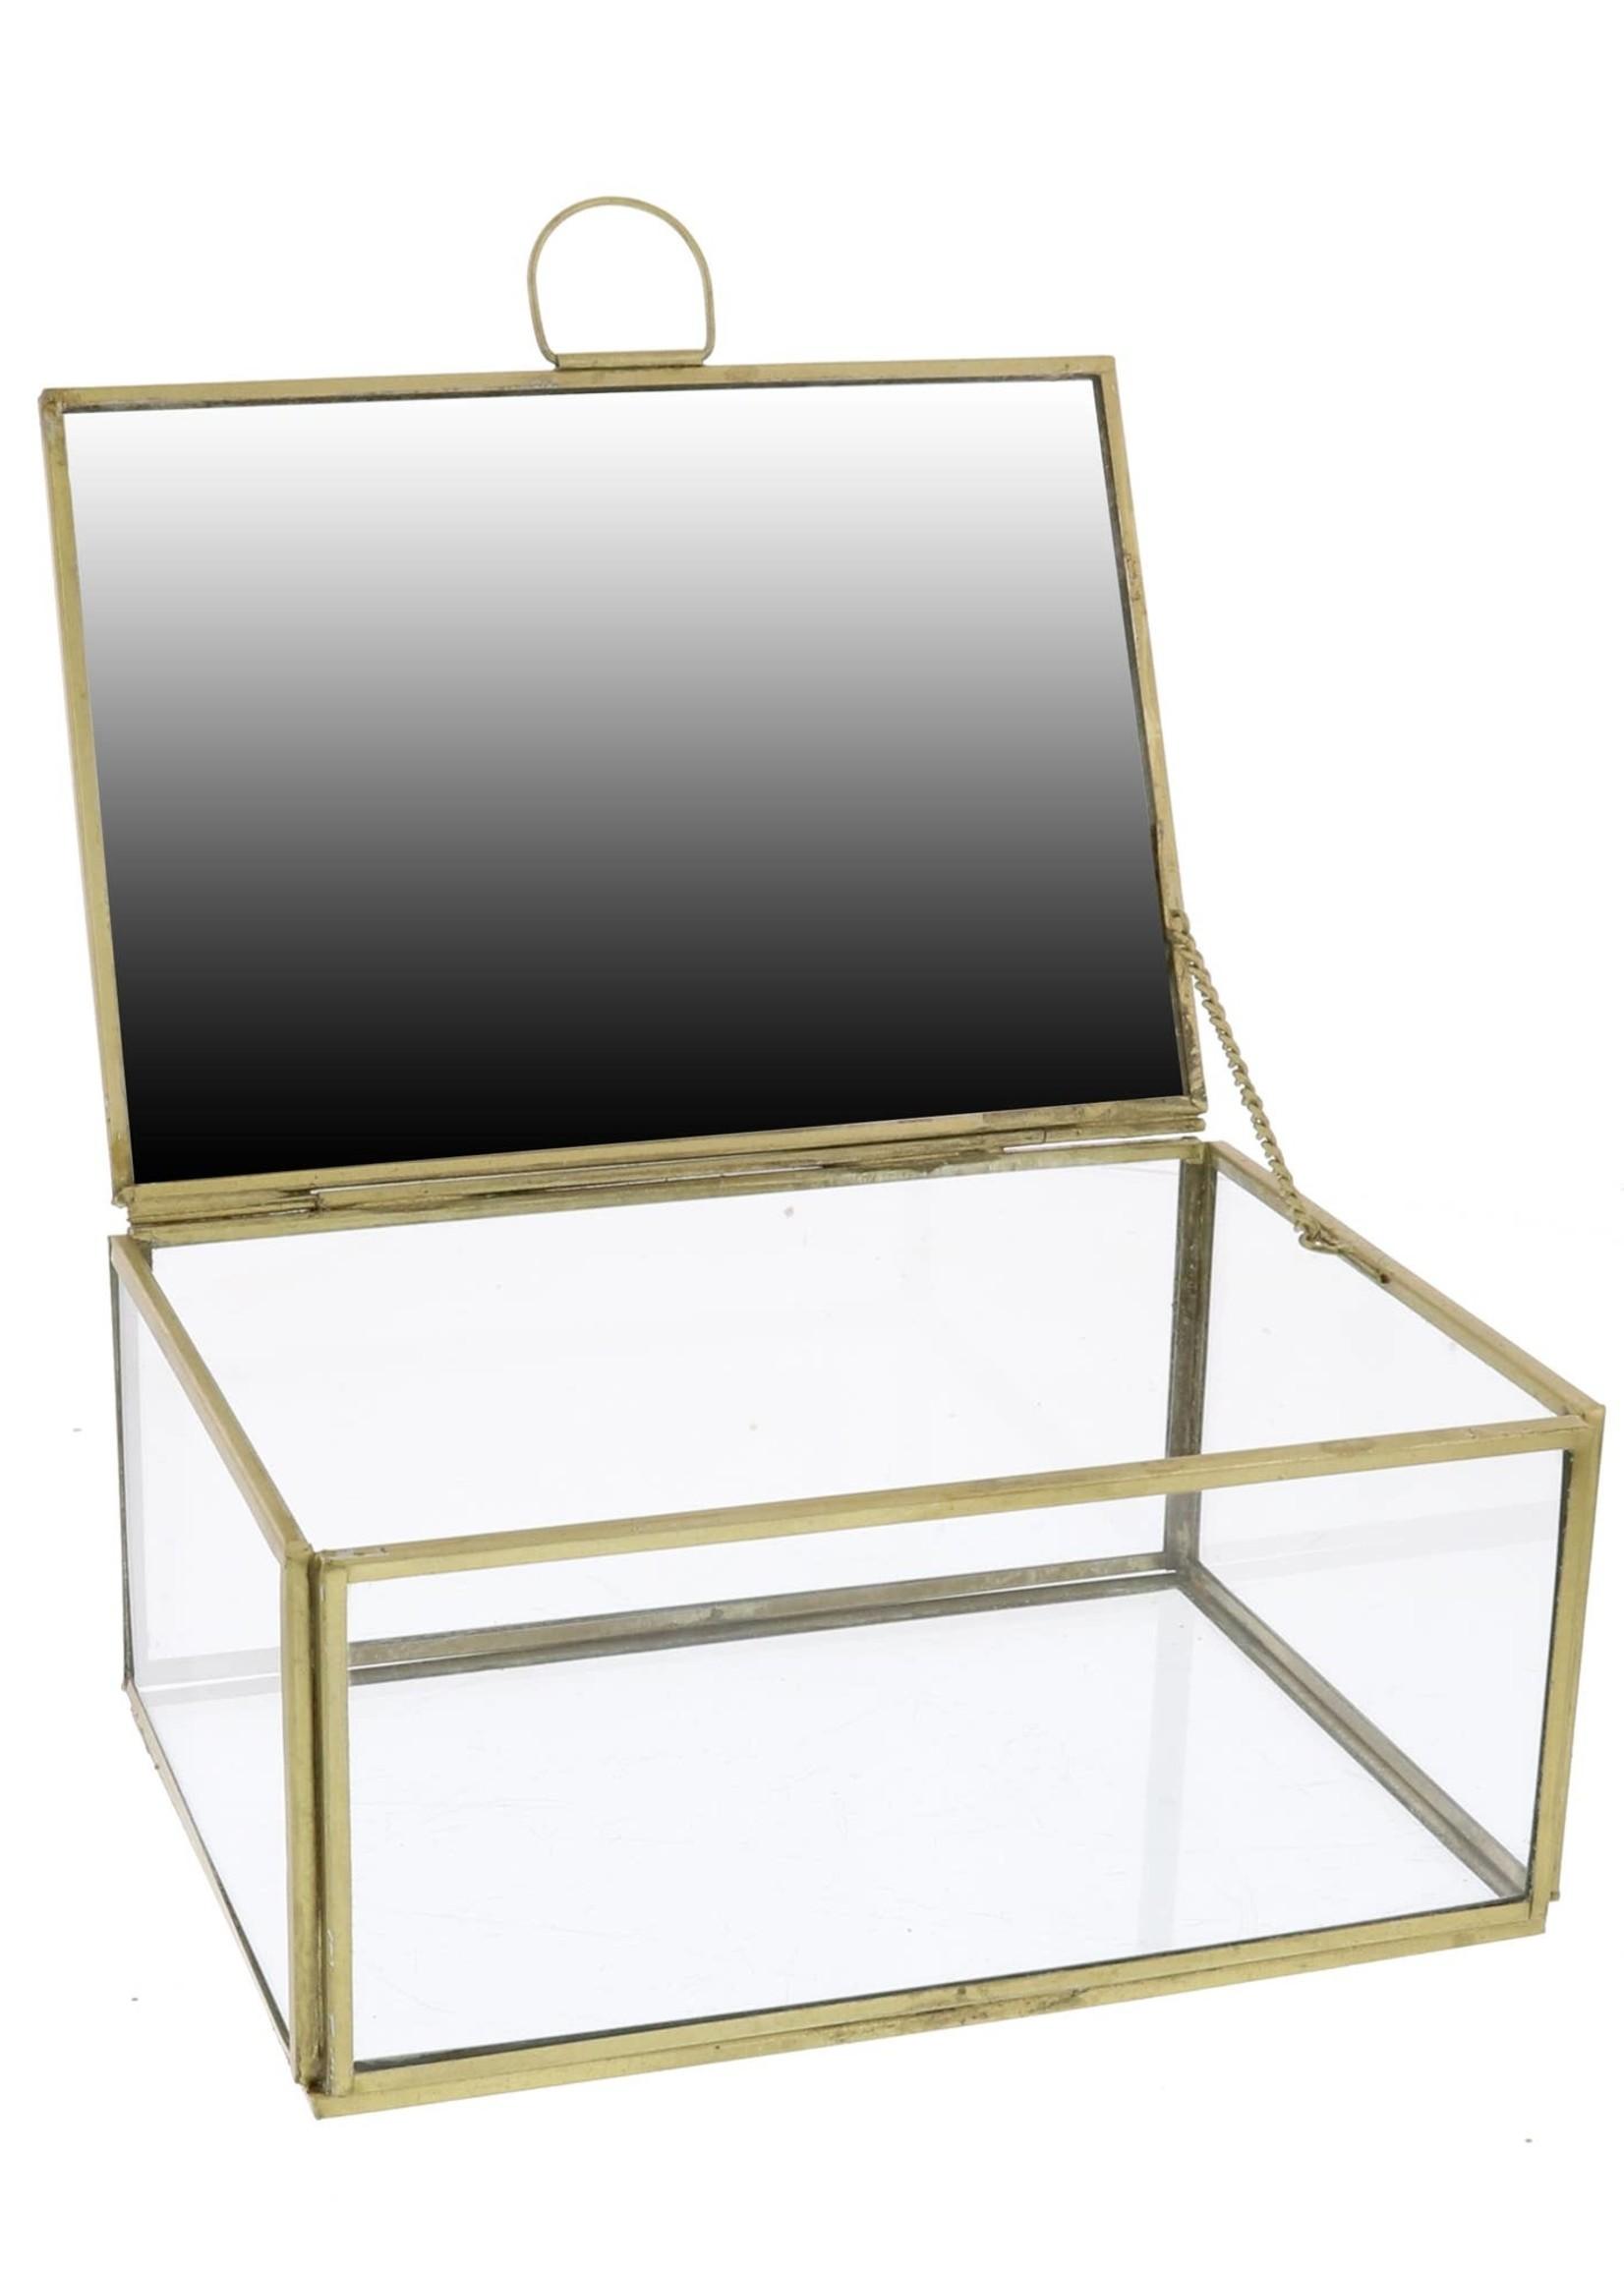 HomArt Jewelry Box with Mirror - Lrg - Brass